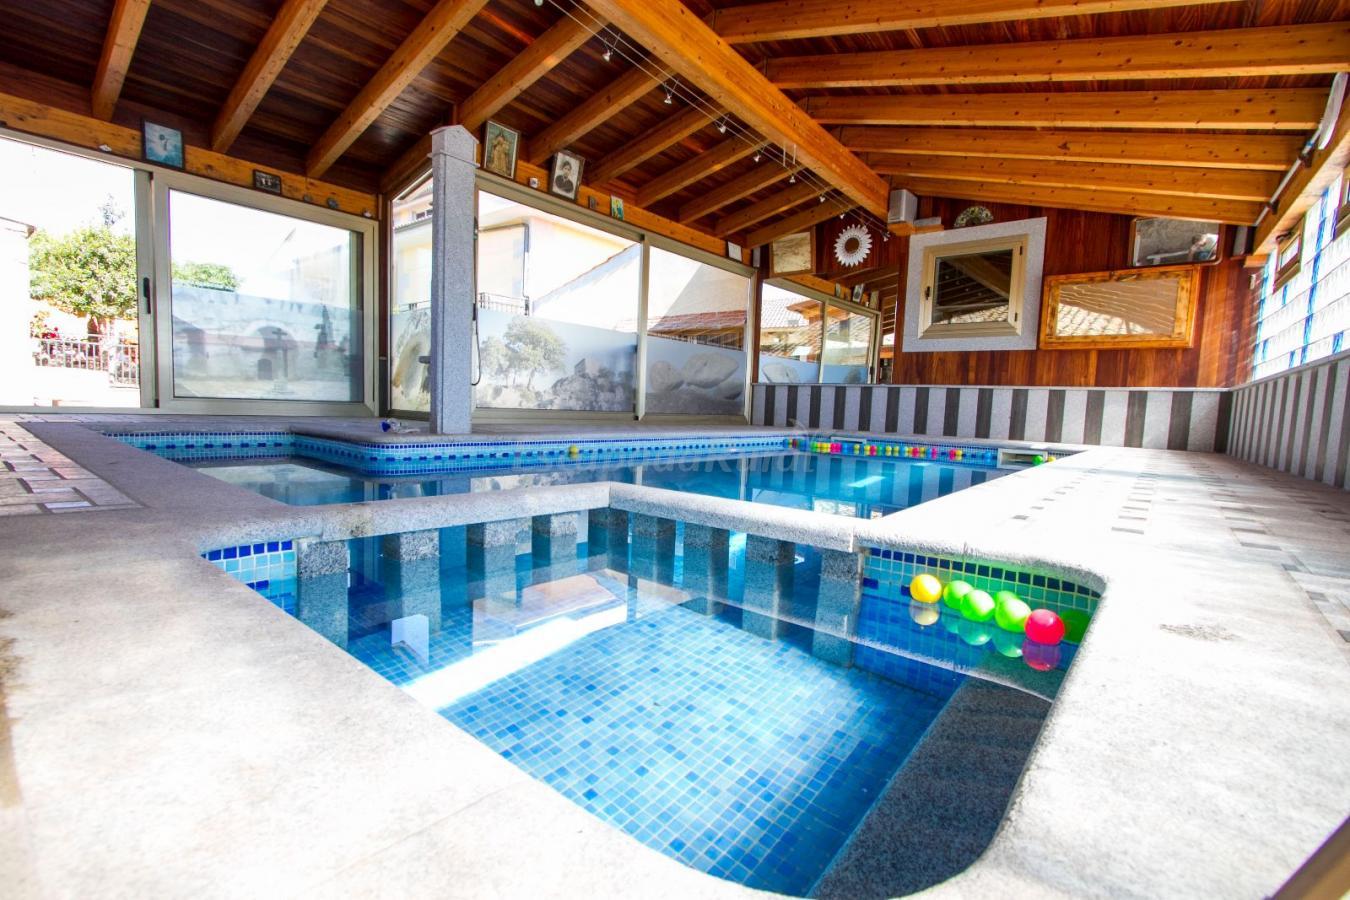 Fotos de casa rural leocadia y casa clemente casa rural for Casas con piscina dentro